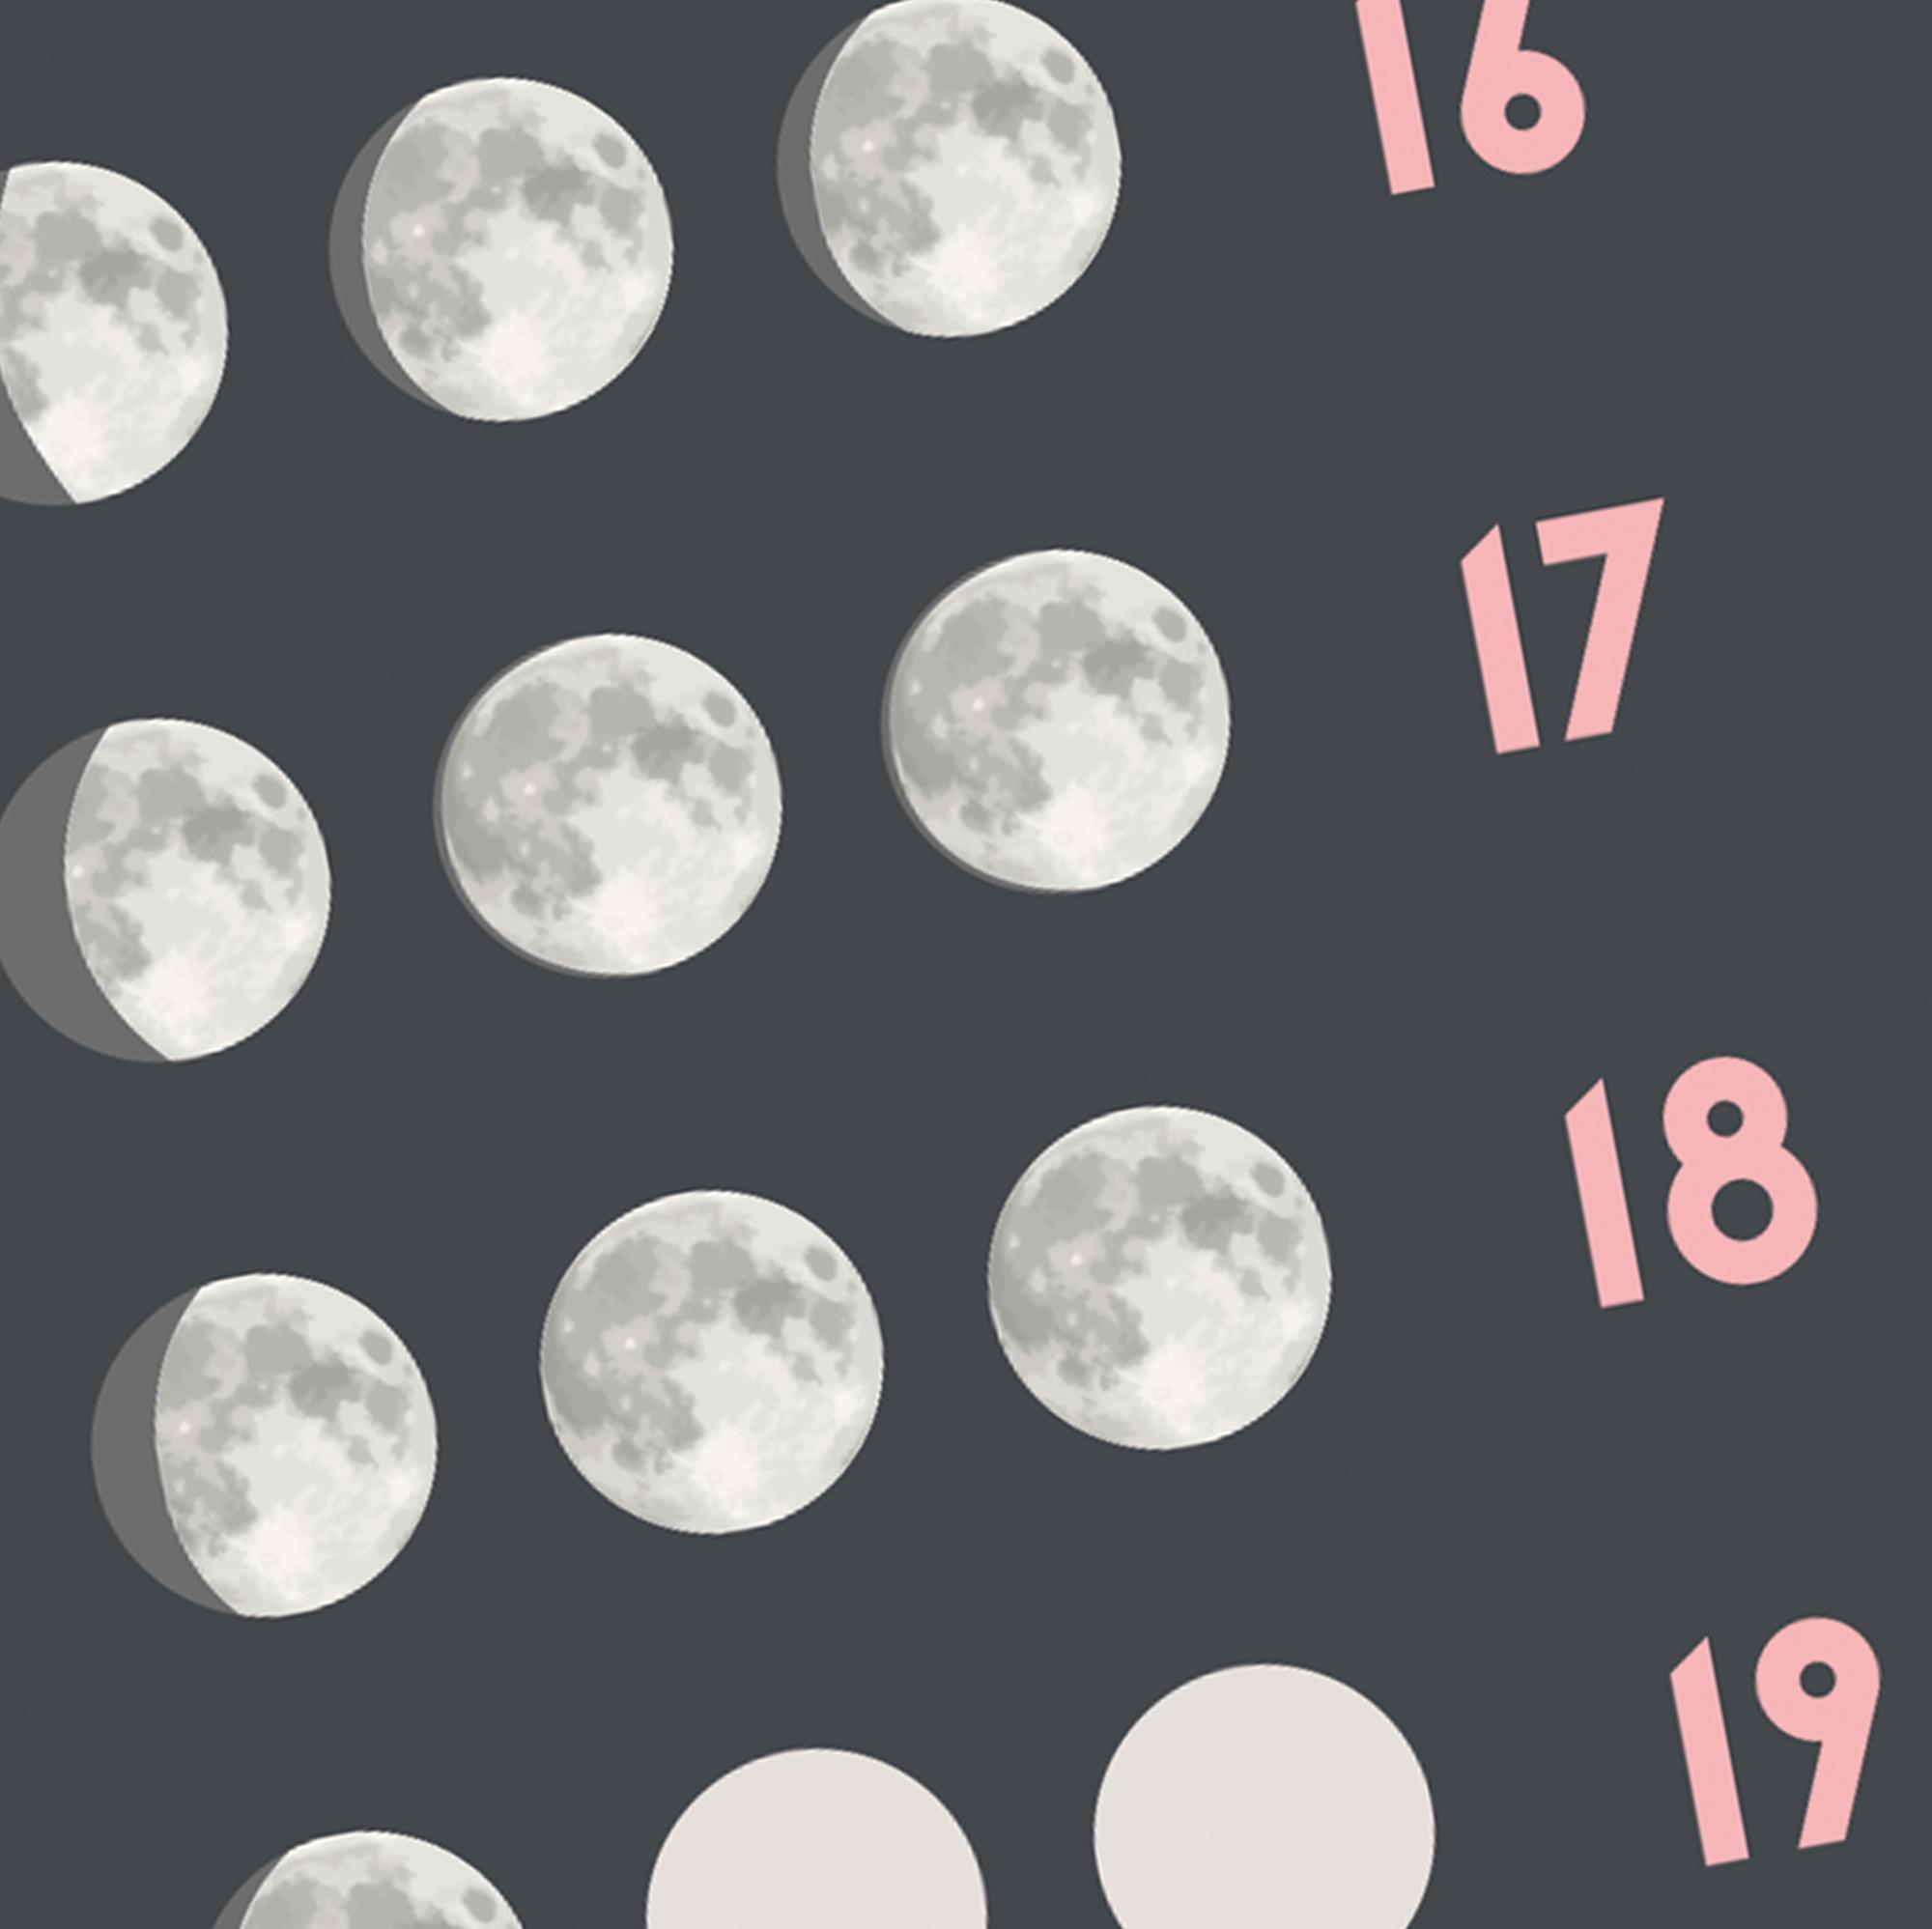 2021 Lunar Calendar - Alice Rose